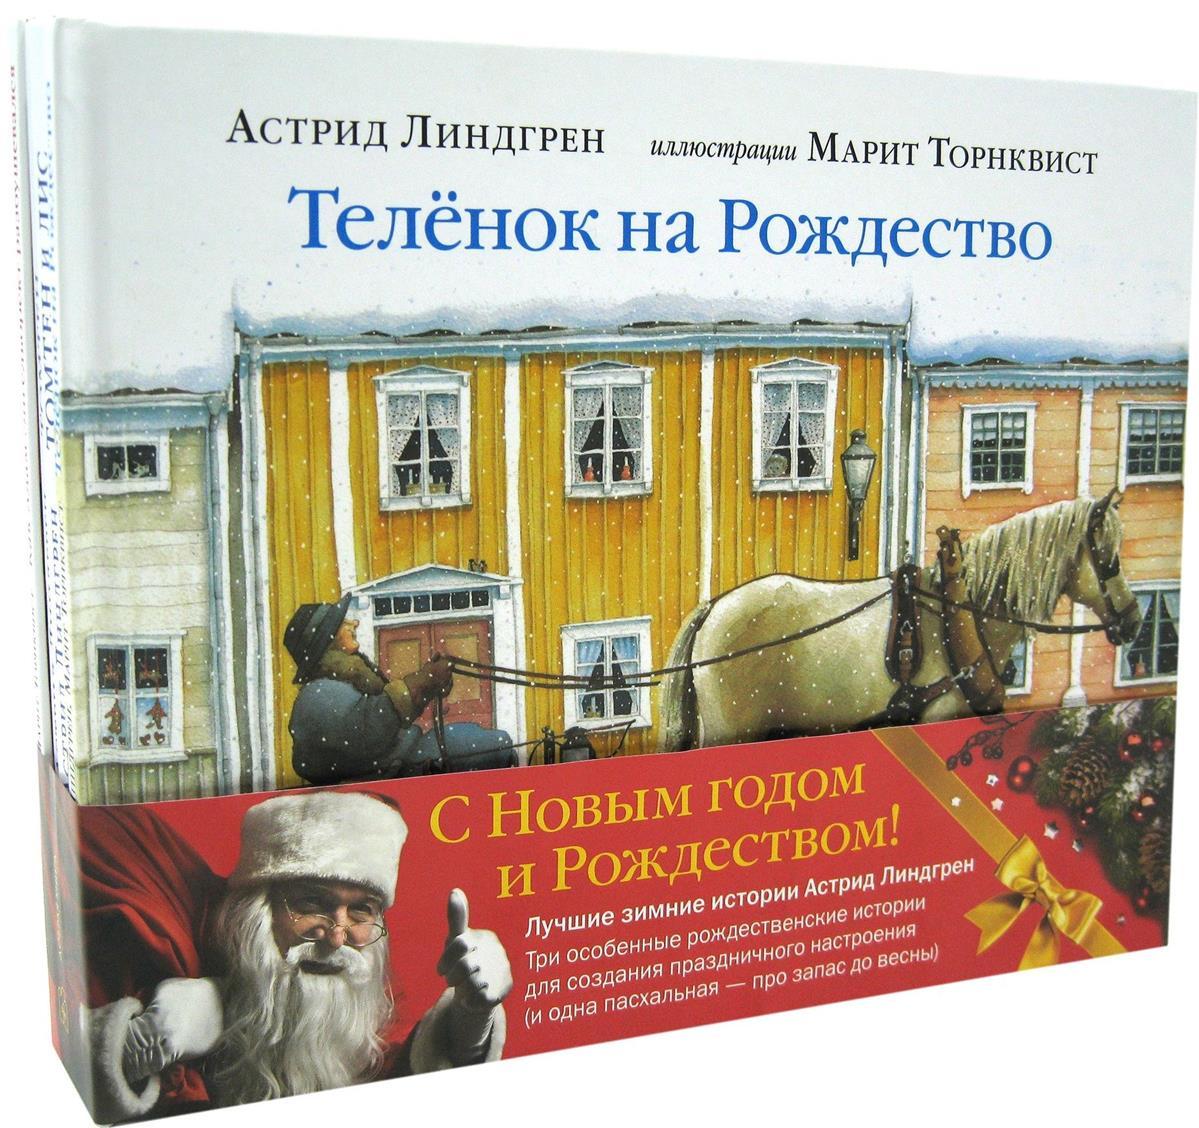 Линдгрен А. Лучшие зимние истории Астрид Линдгрен (комплект из 4 книг) цена